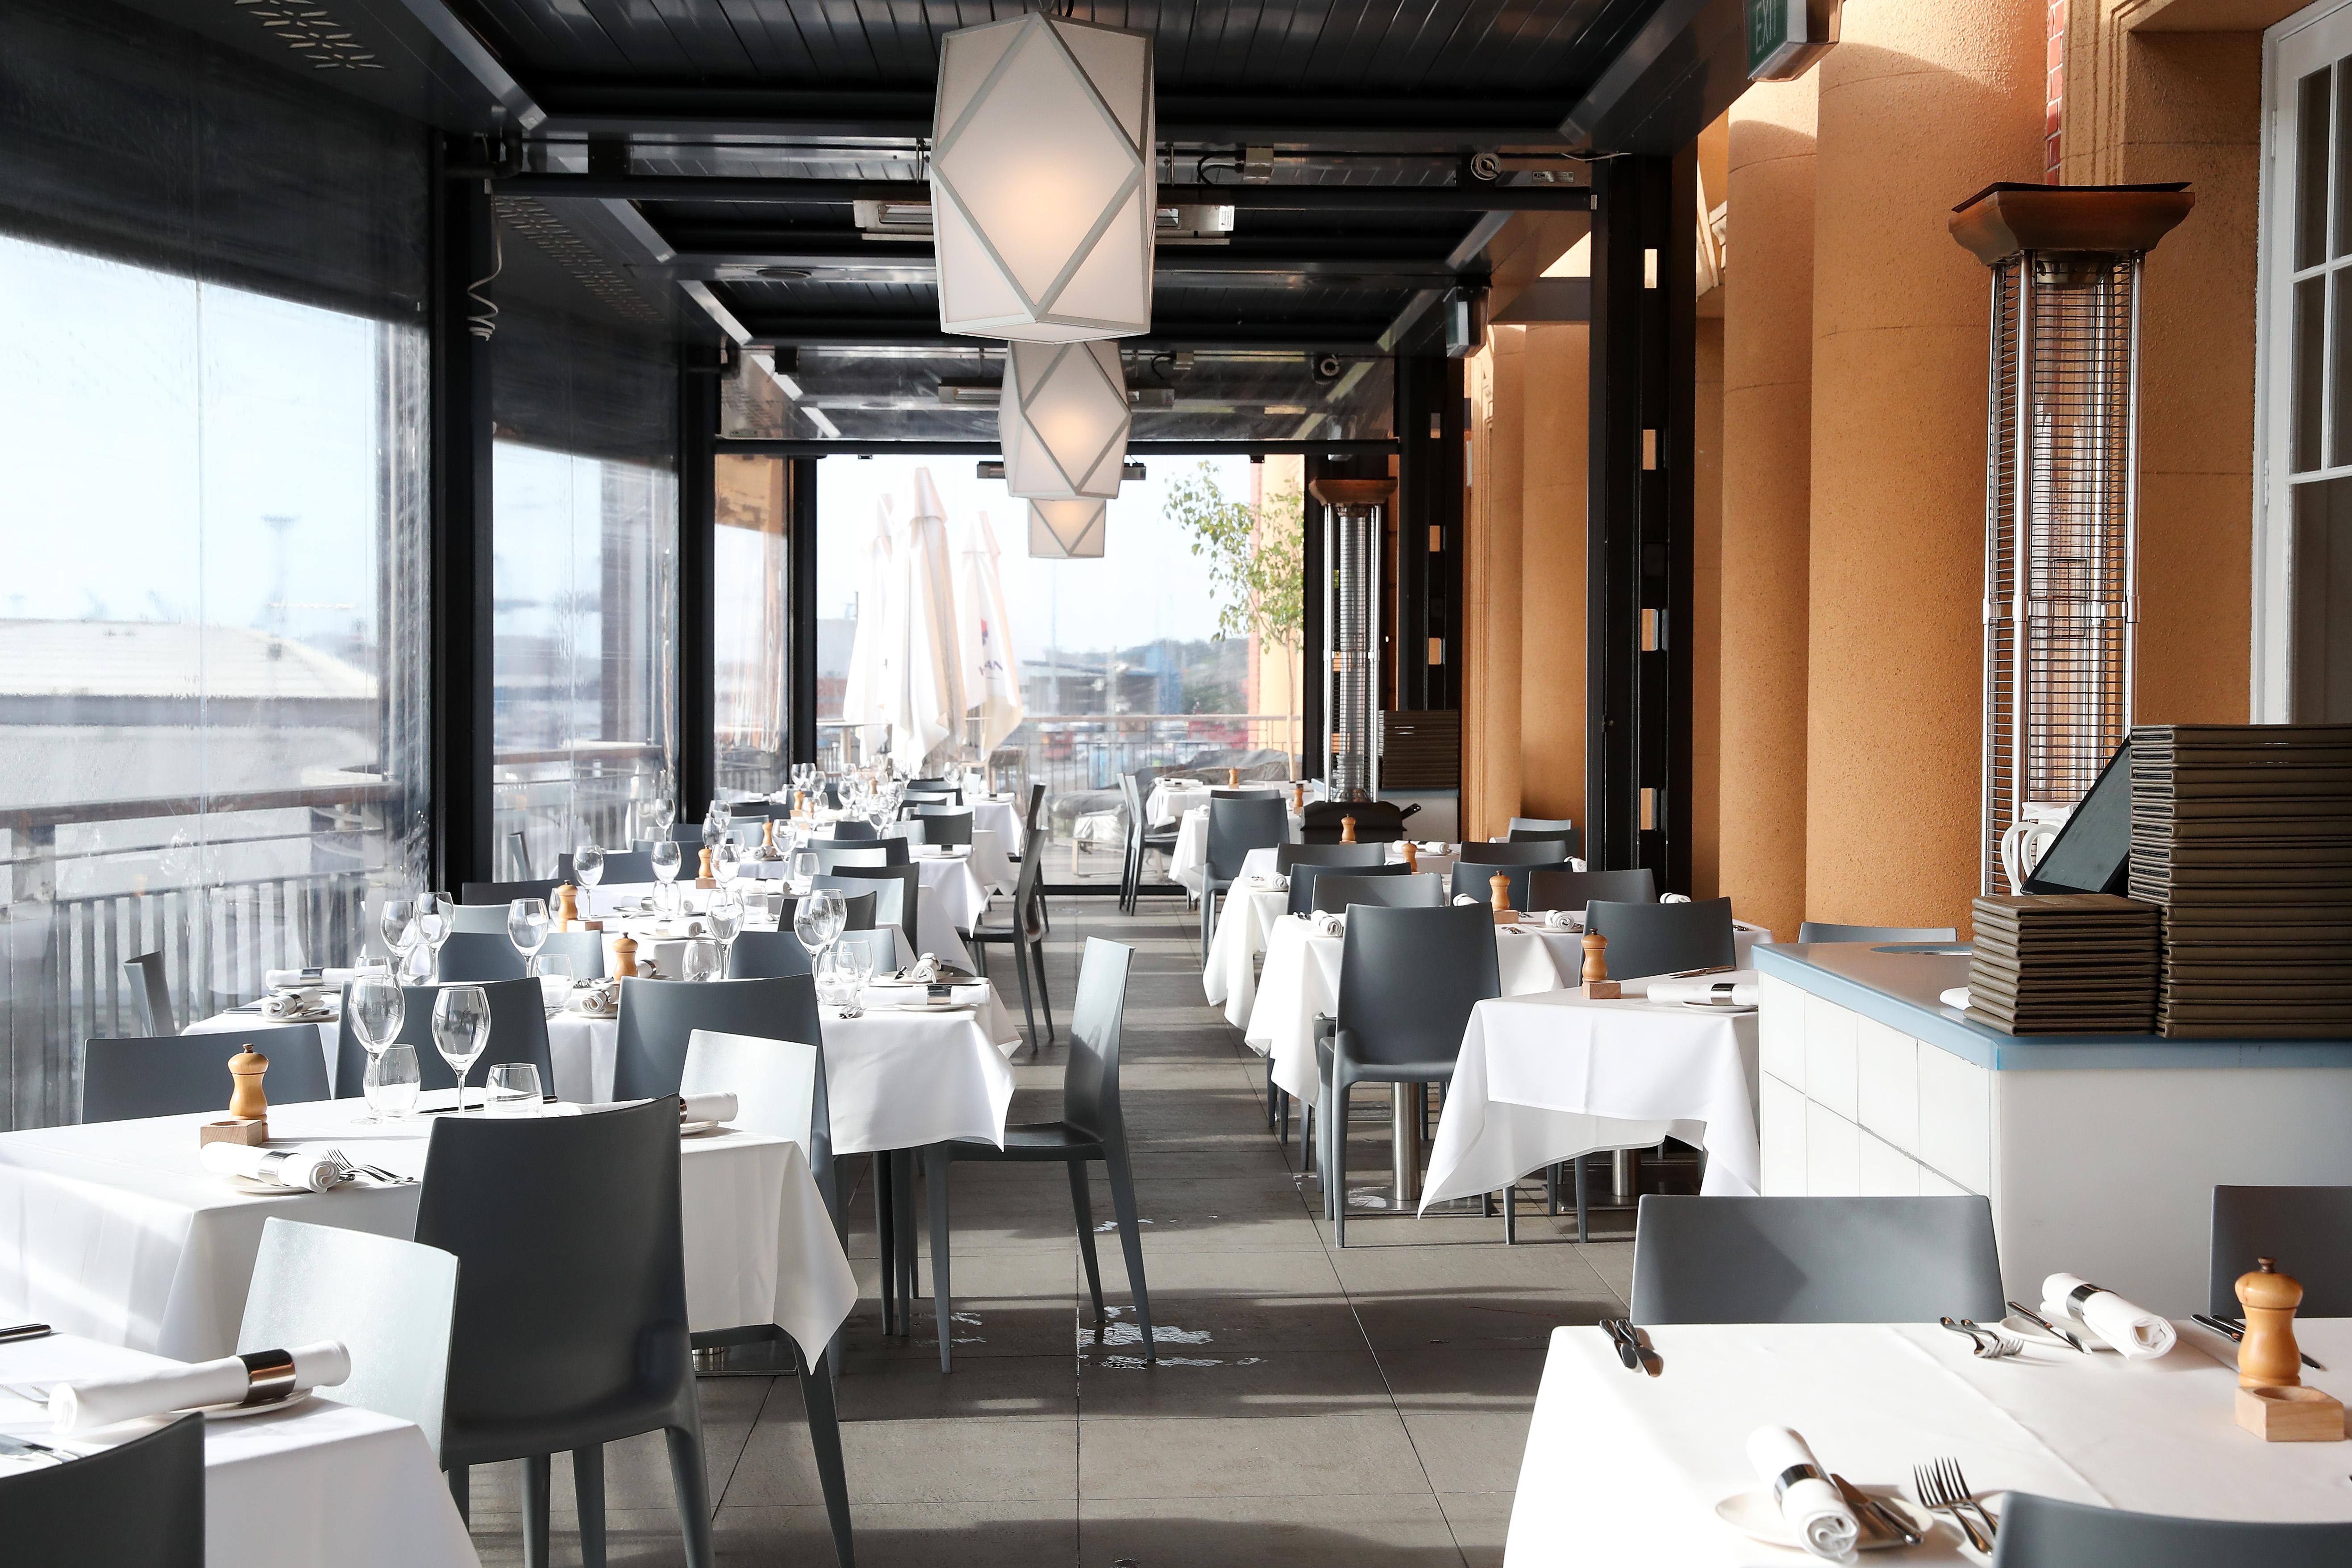 Restaurant review: Harbourside Ocean Bar Grill, Auckland CBD